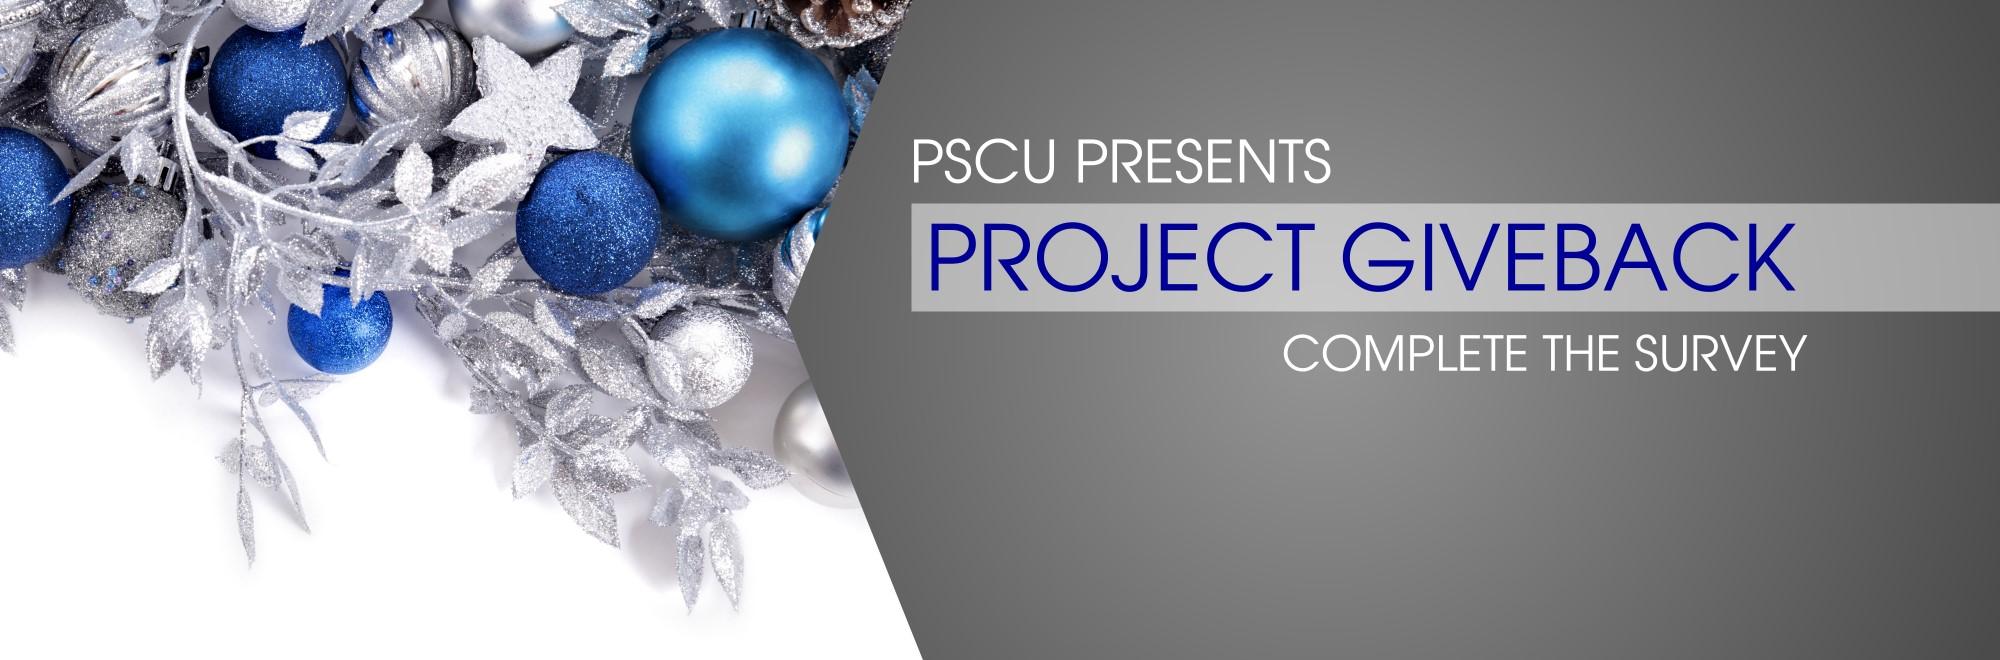 PSCU Presents Project Giveback Complete the survey